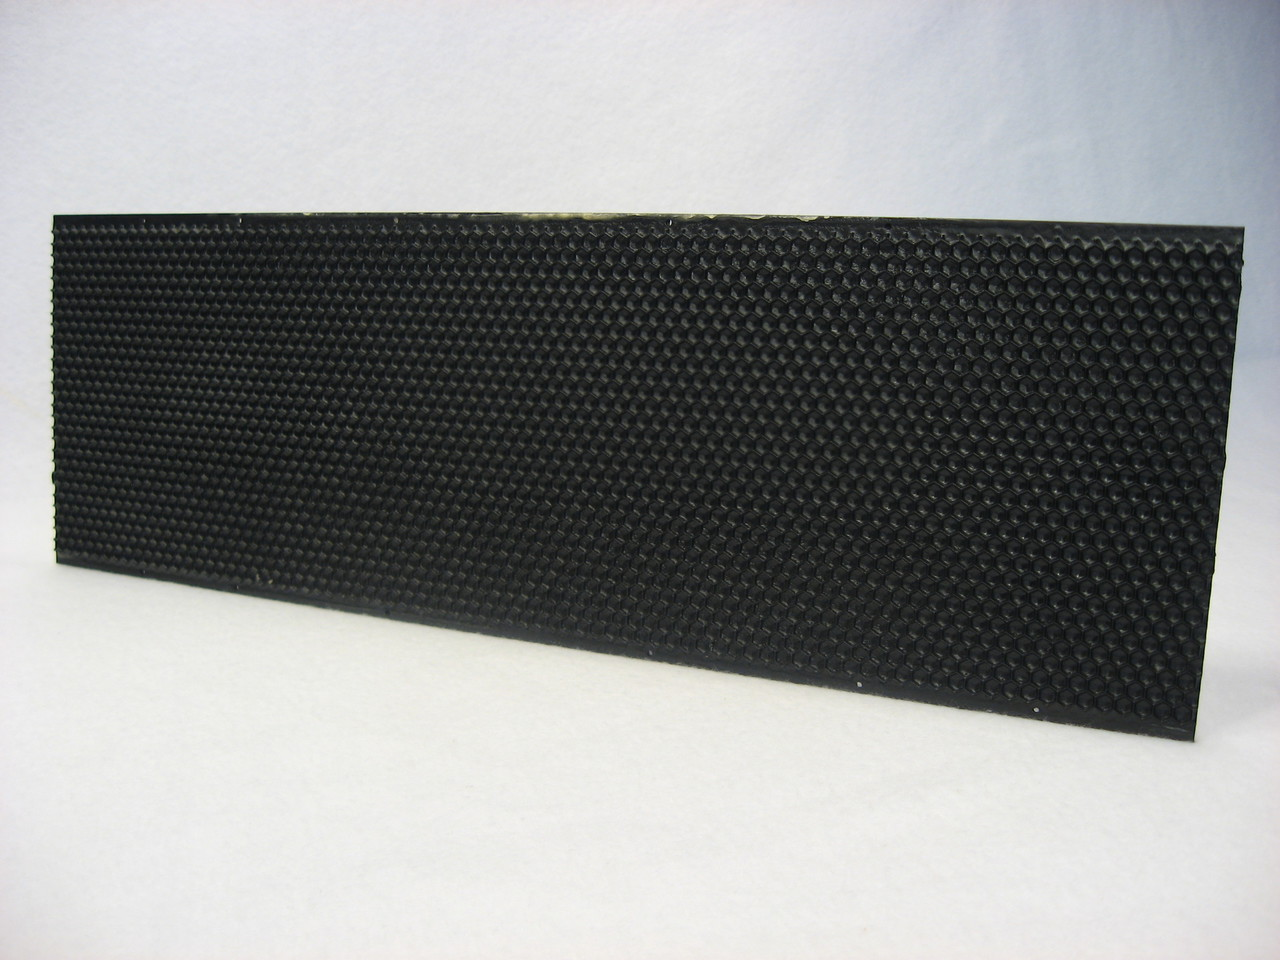 "5-5/8"" wax coated black plastic foundation"